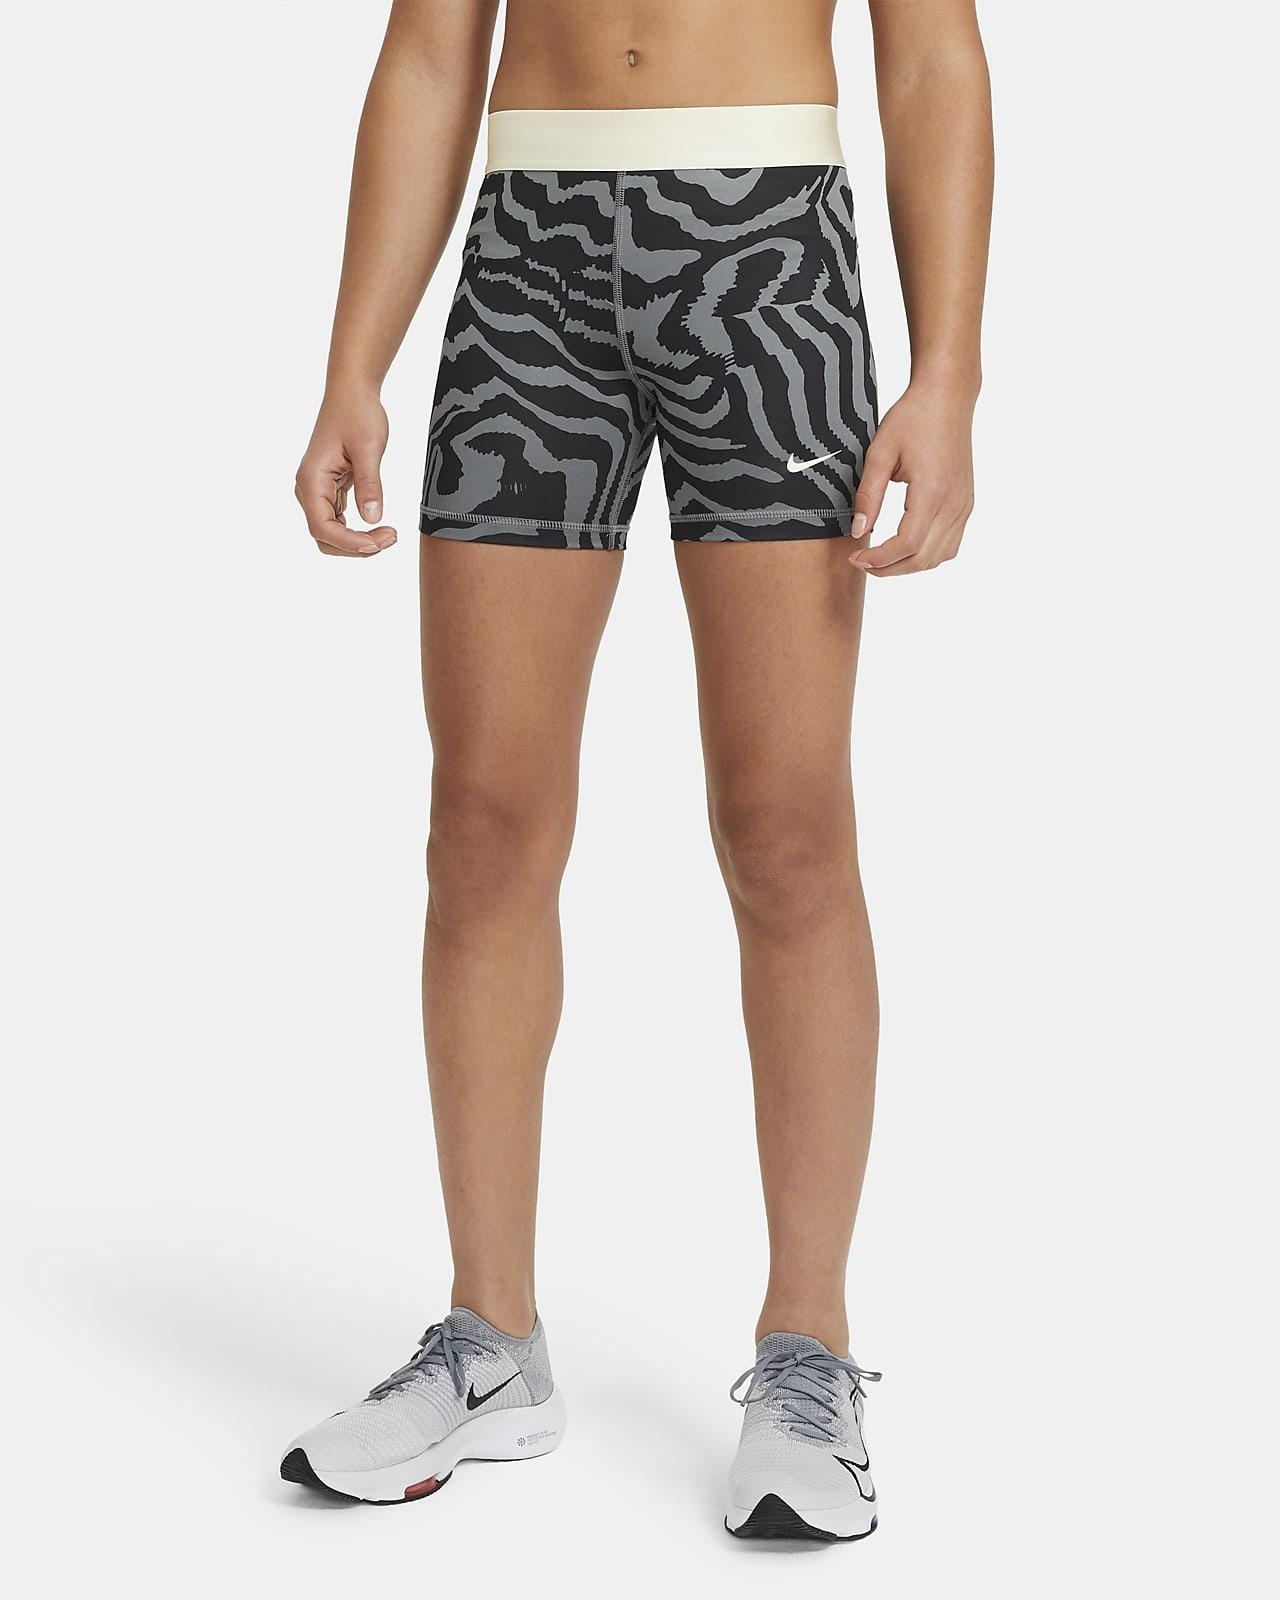 Nike Pro Older Kids' (Girls') 7cm (approx.) Printed Shorts